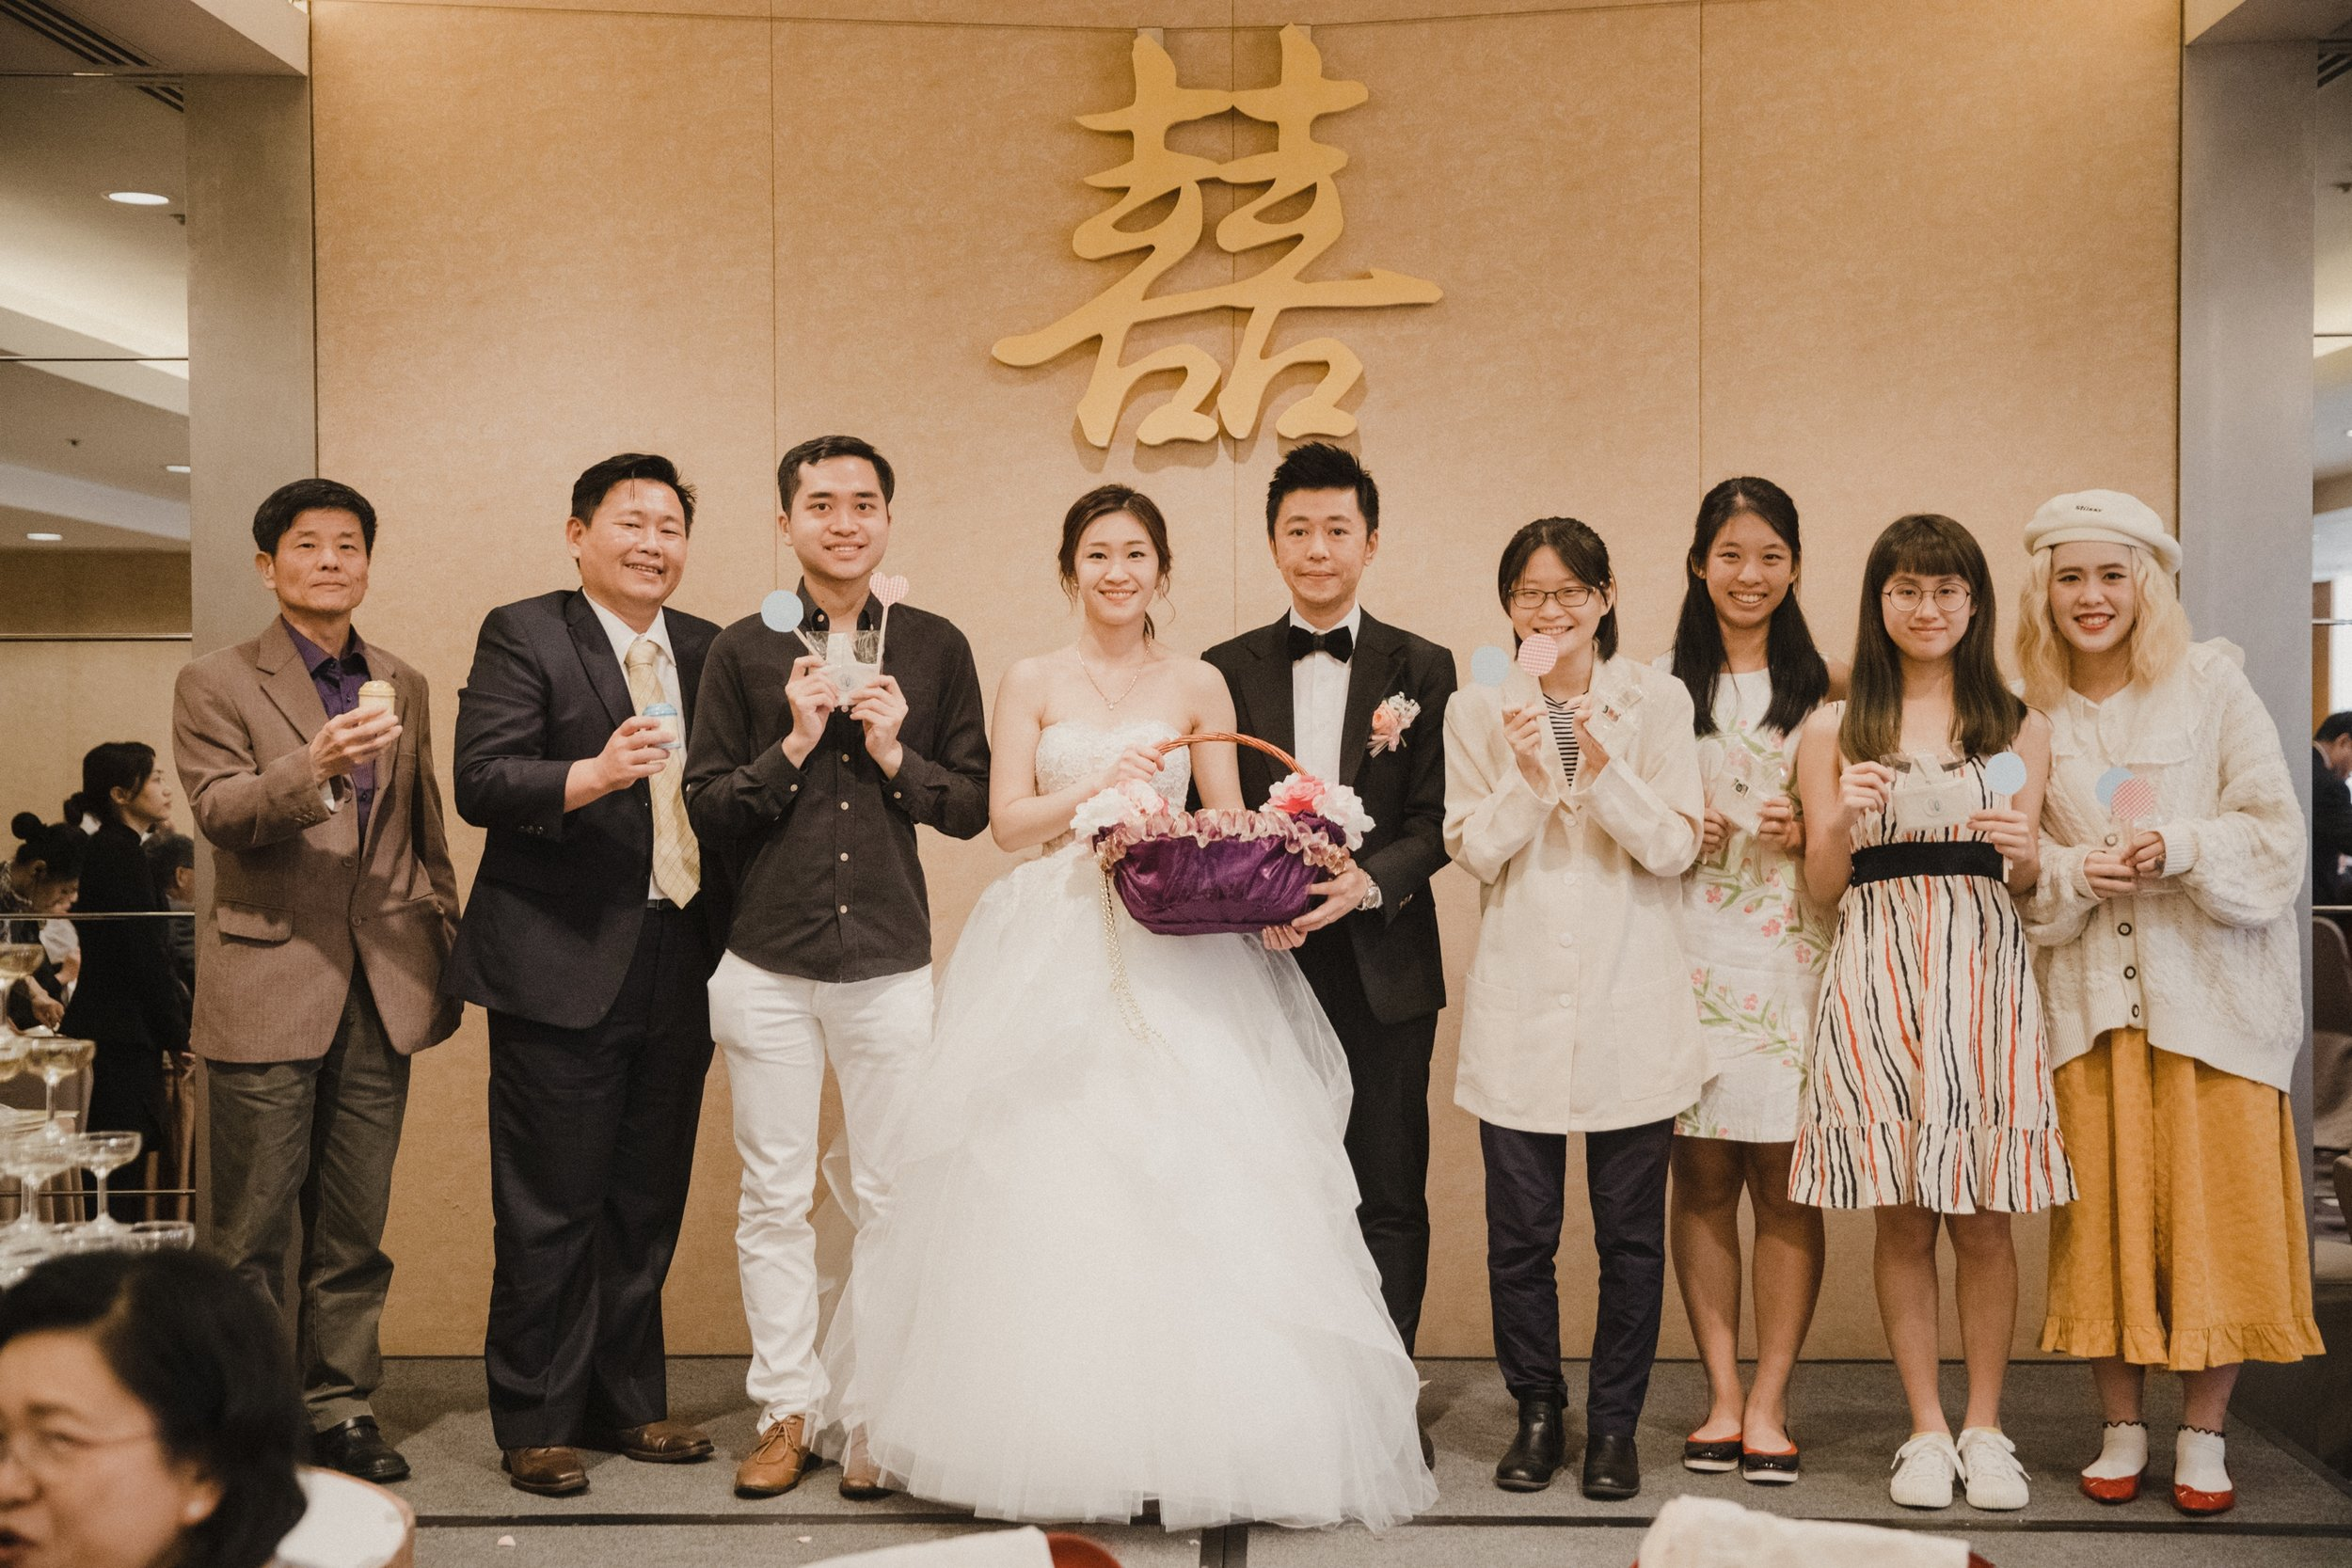 wedding-caridee-oscar-lunch-ambassador-hsinchu-結婚午宴-新竹國賓_131.jpg